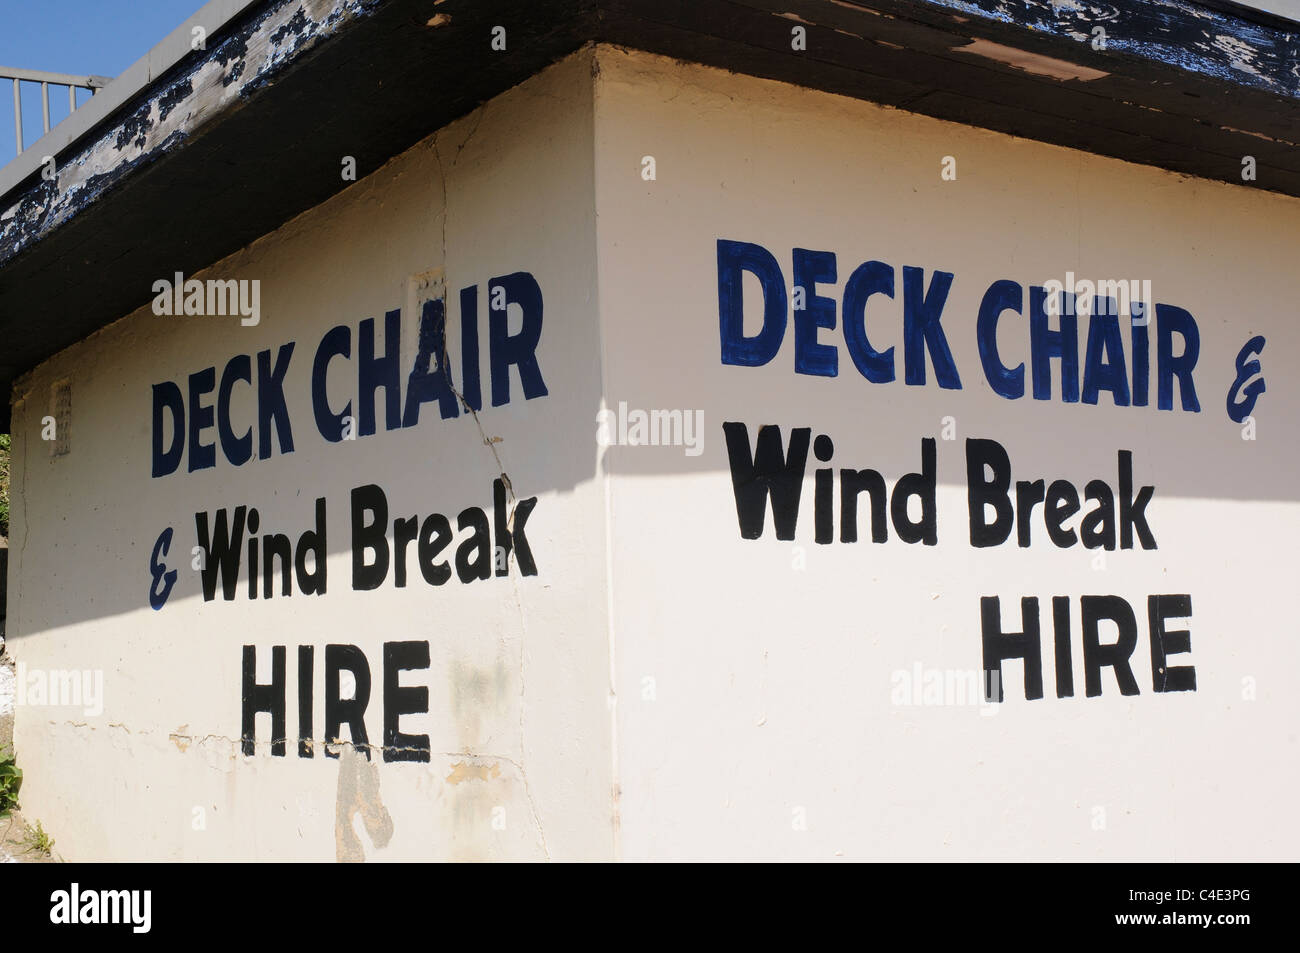 Deckchair For Hire Stock Photos Amp Deckchair For Hire Stock